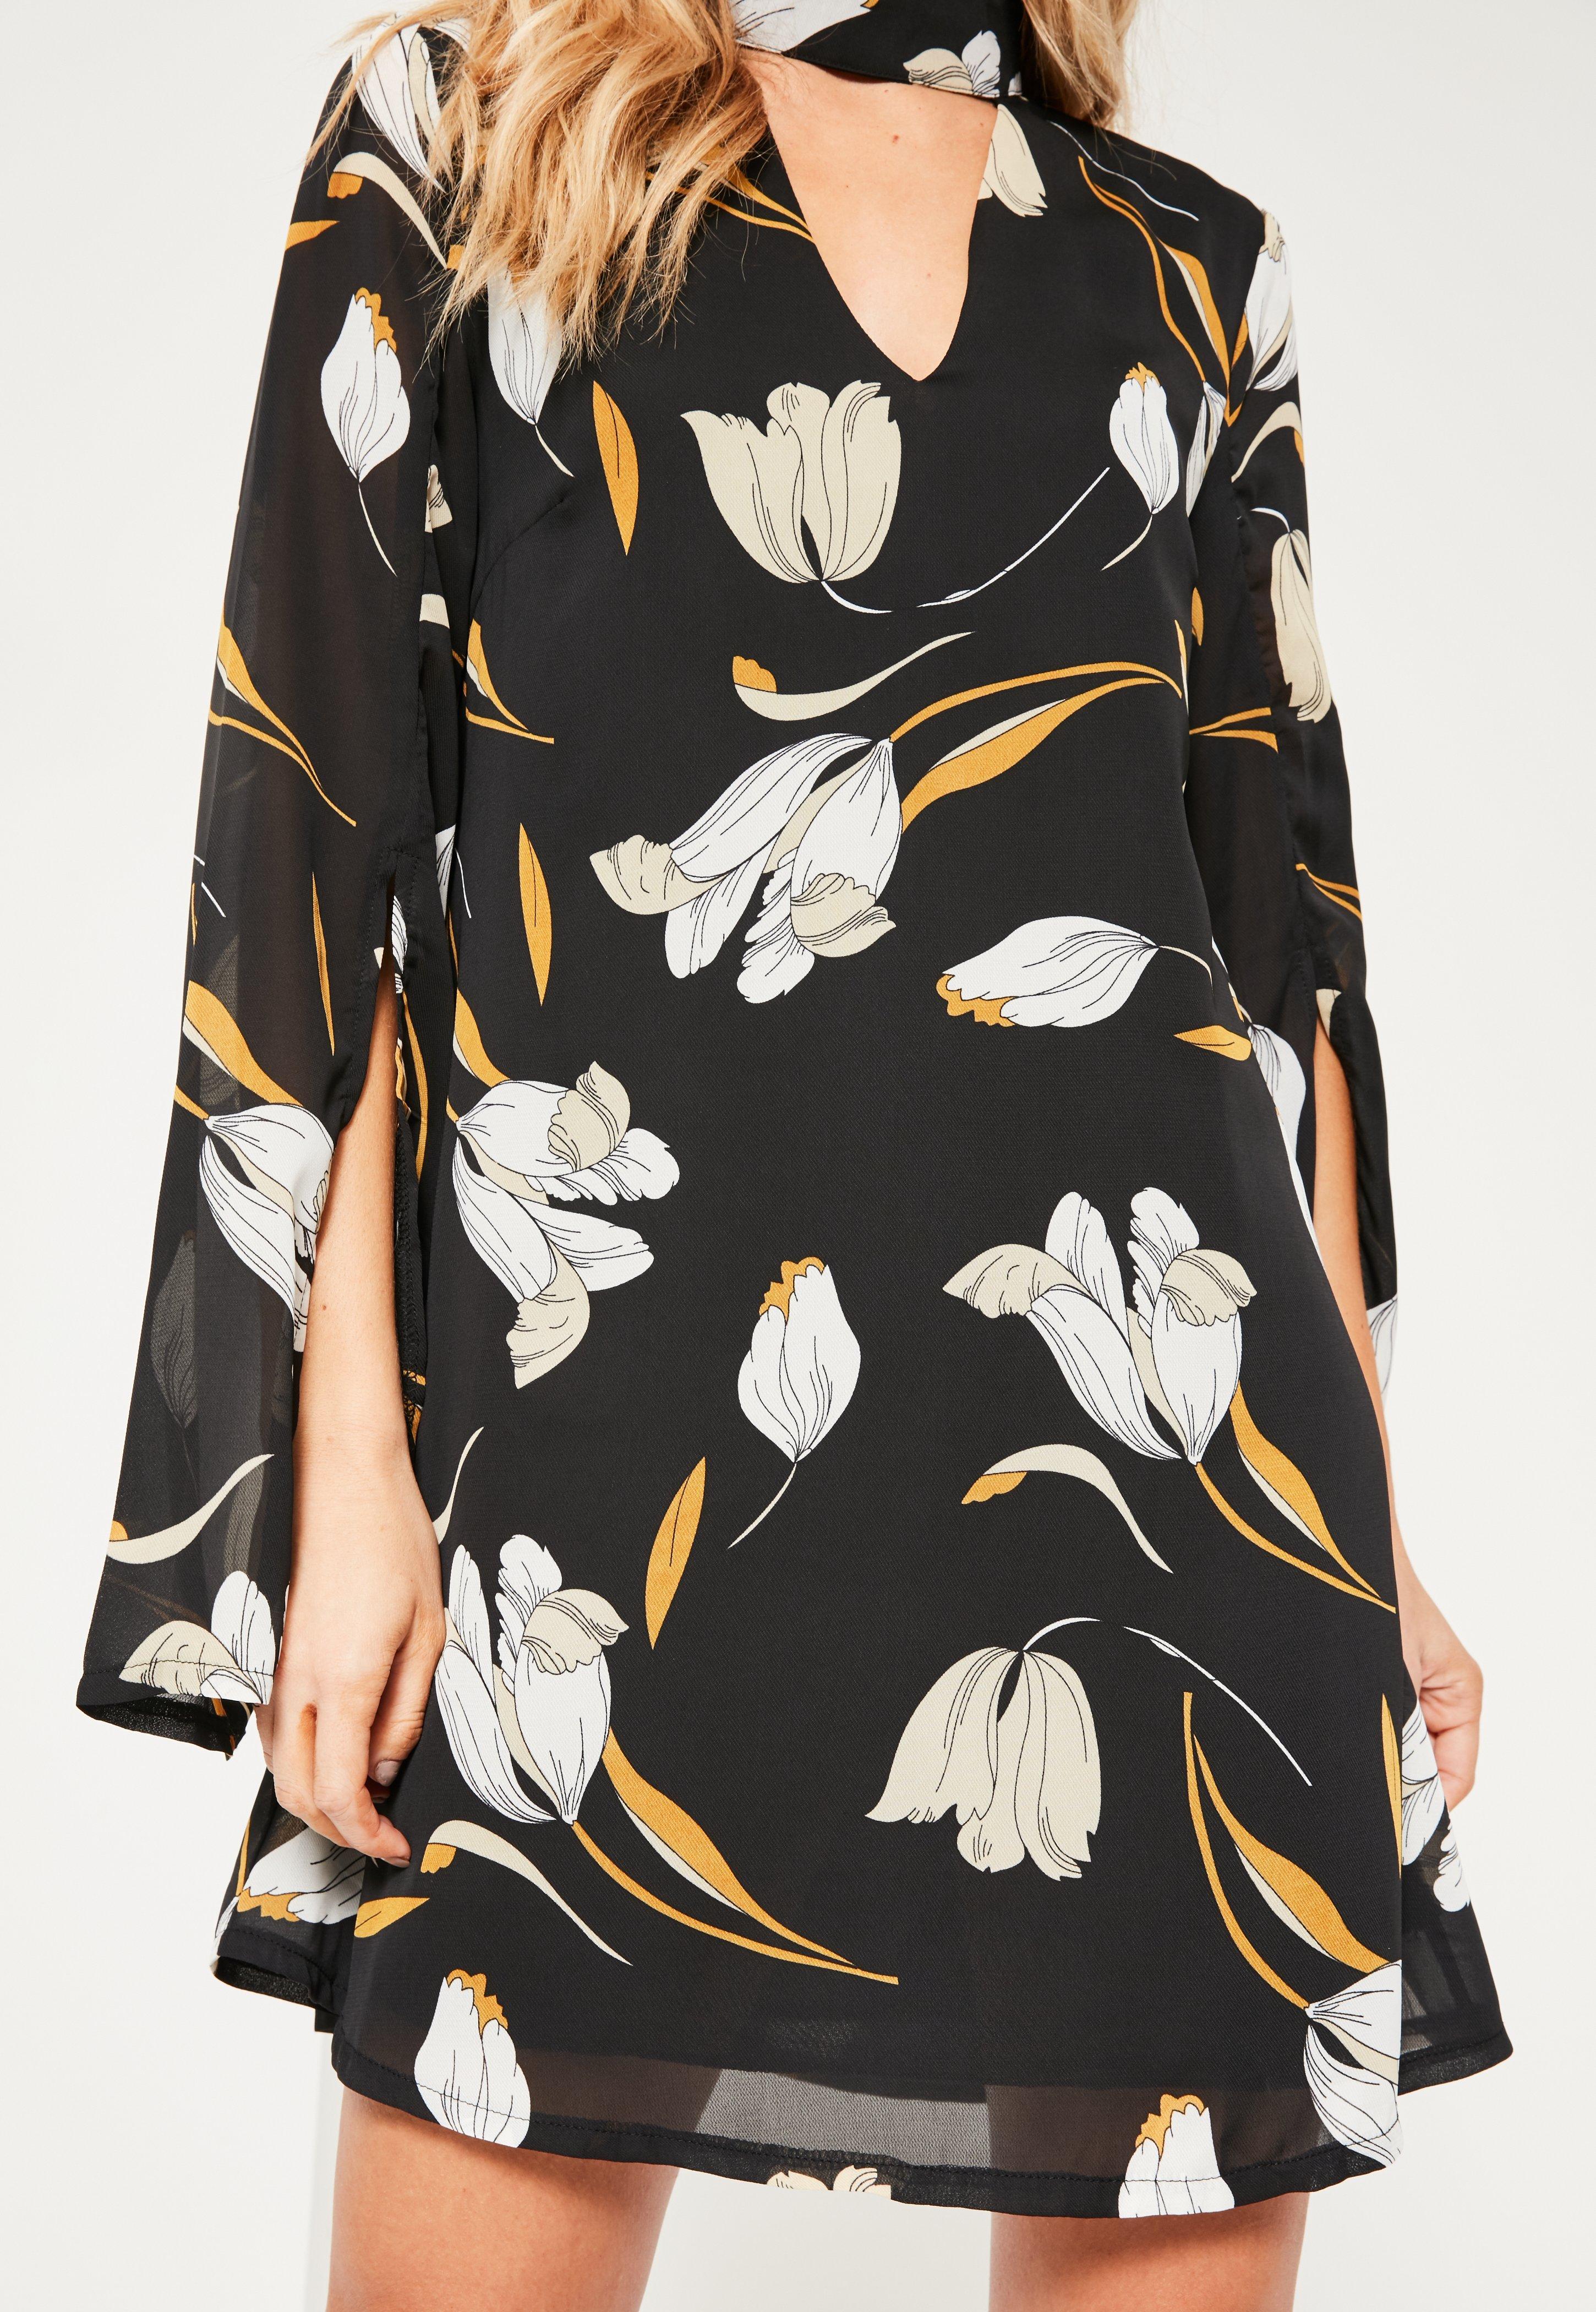 Black Tulip Print Choker Neck Shift Dress